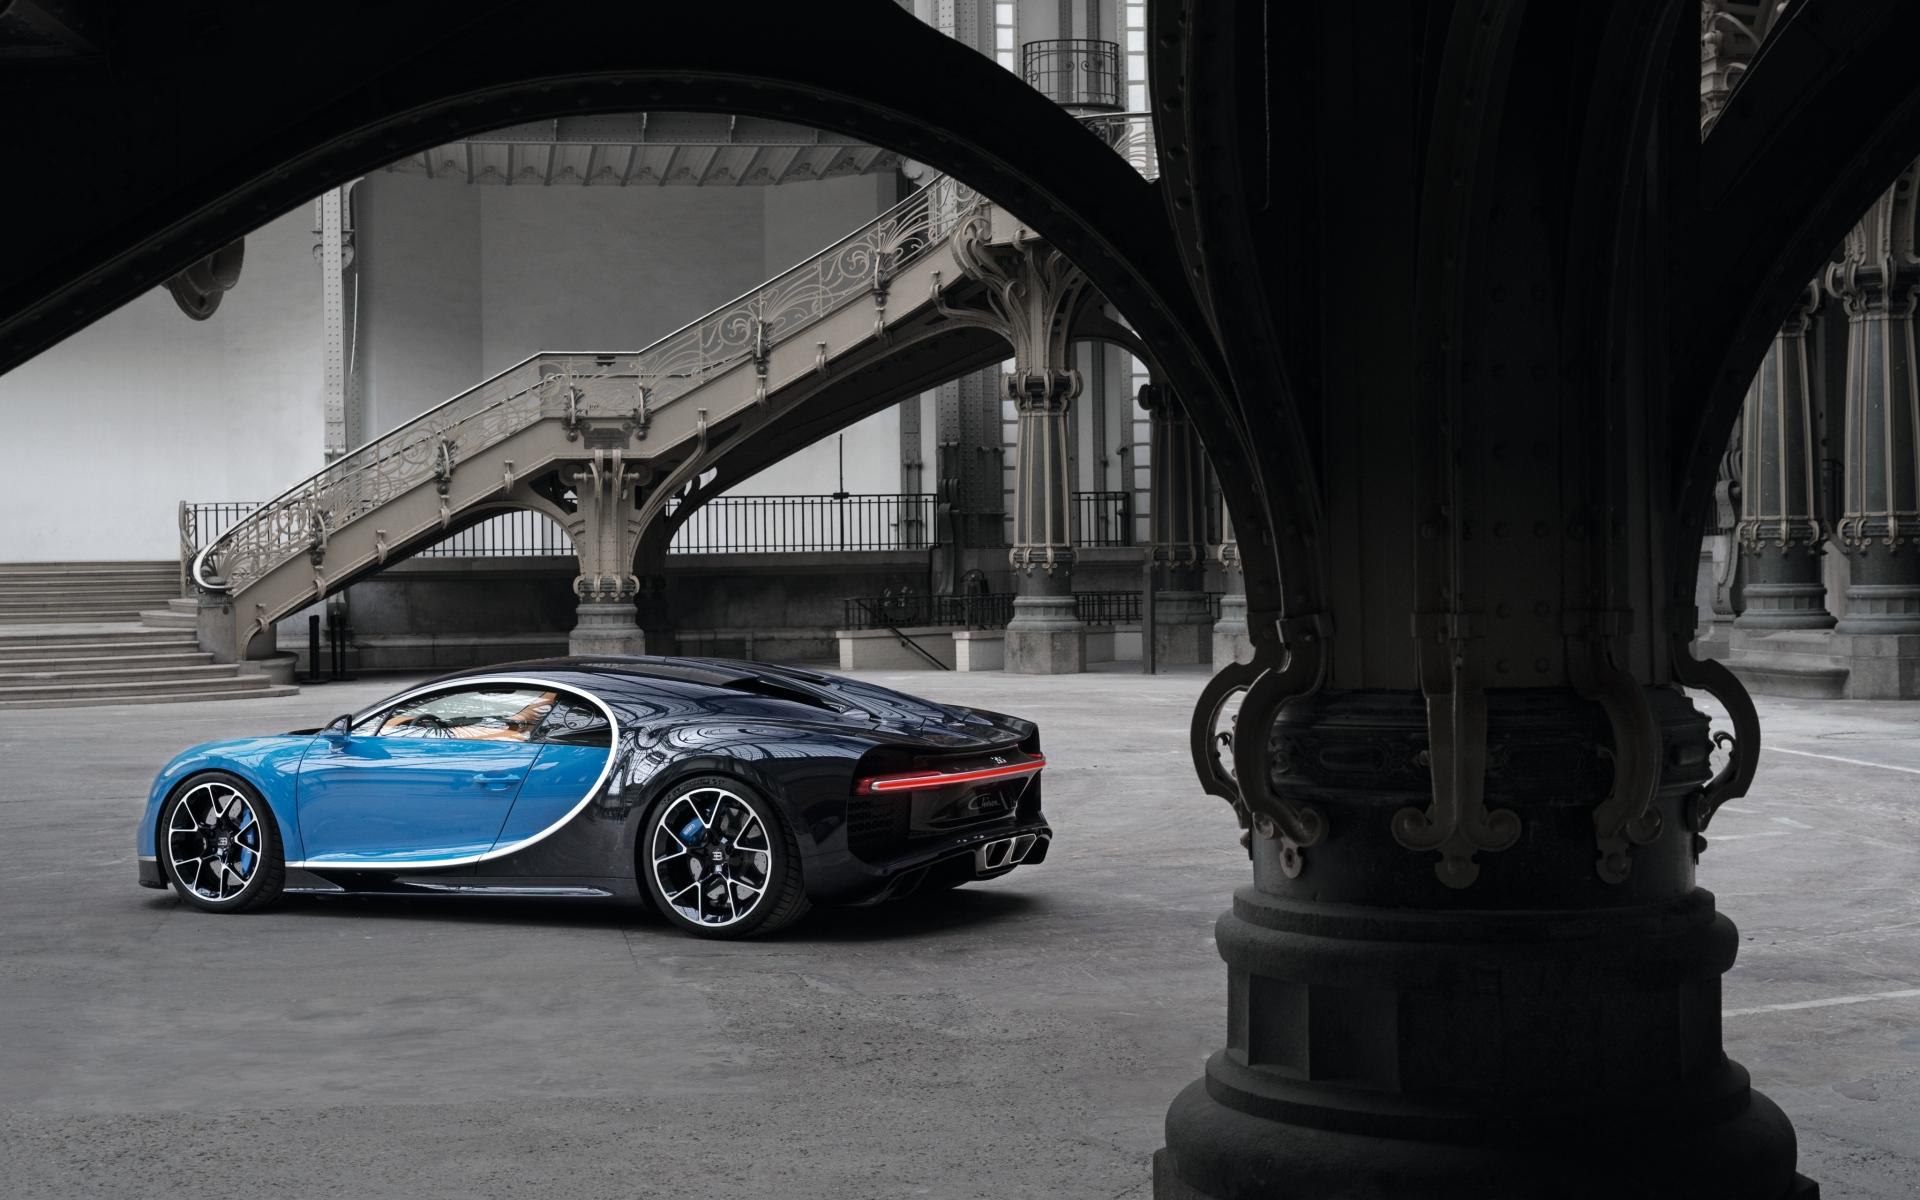 Картинки Bugatti, chiron, вид сбоку фото и обои на рабочий стол